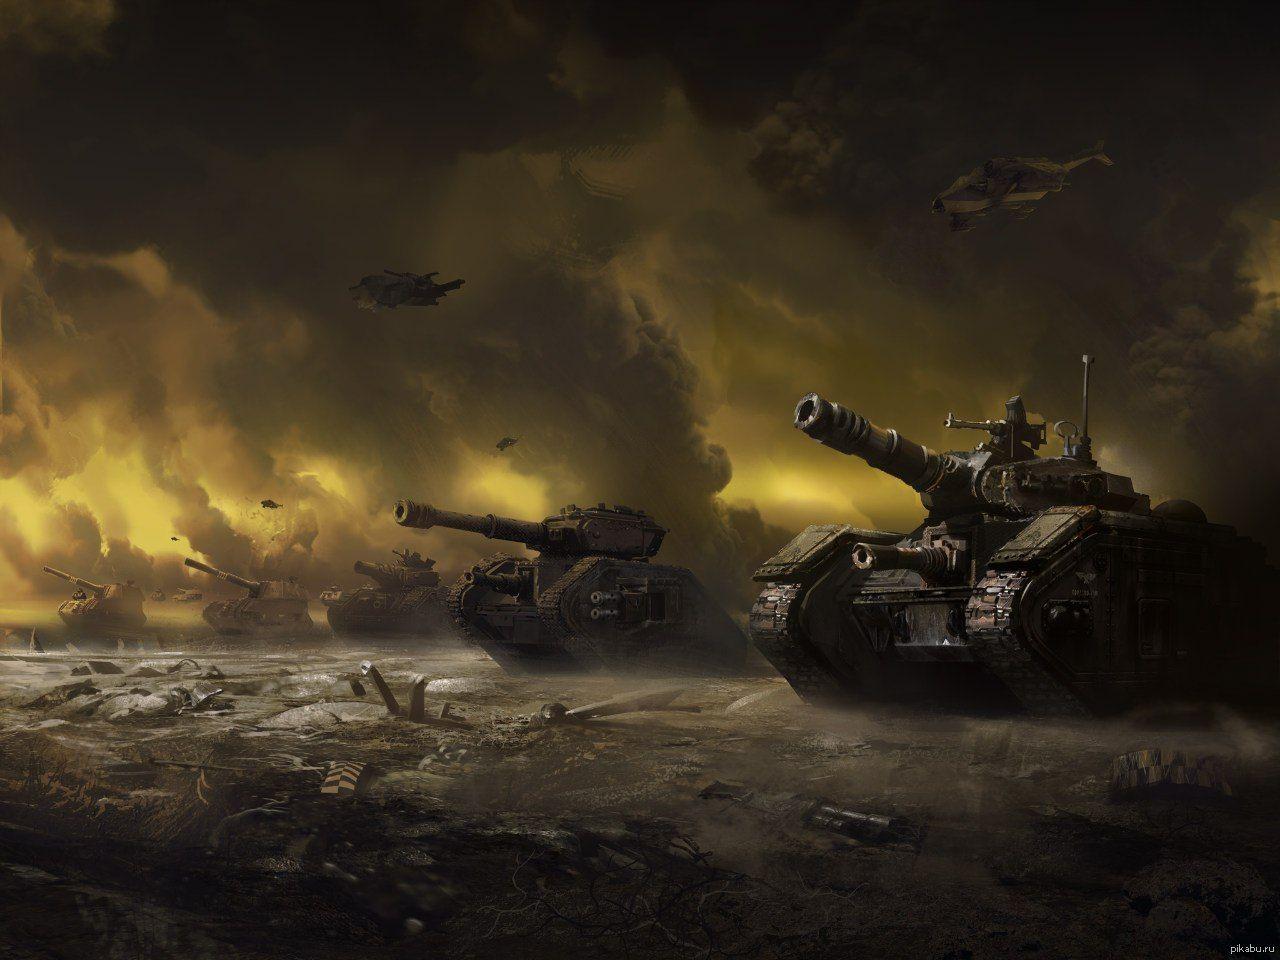 40k Wallpapers Warhammer Imperial Guard Warhammer Art 40k